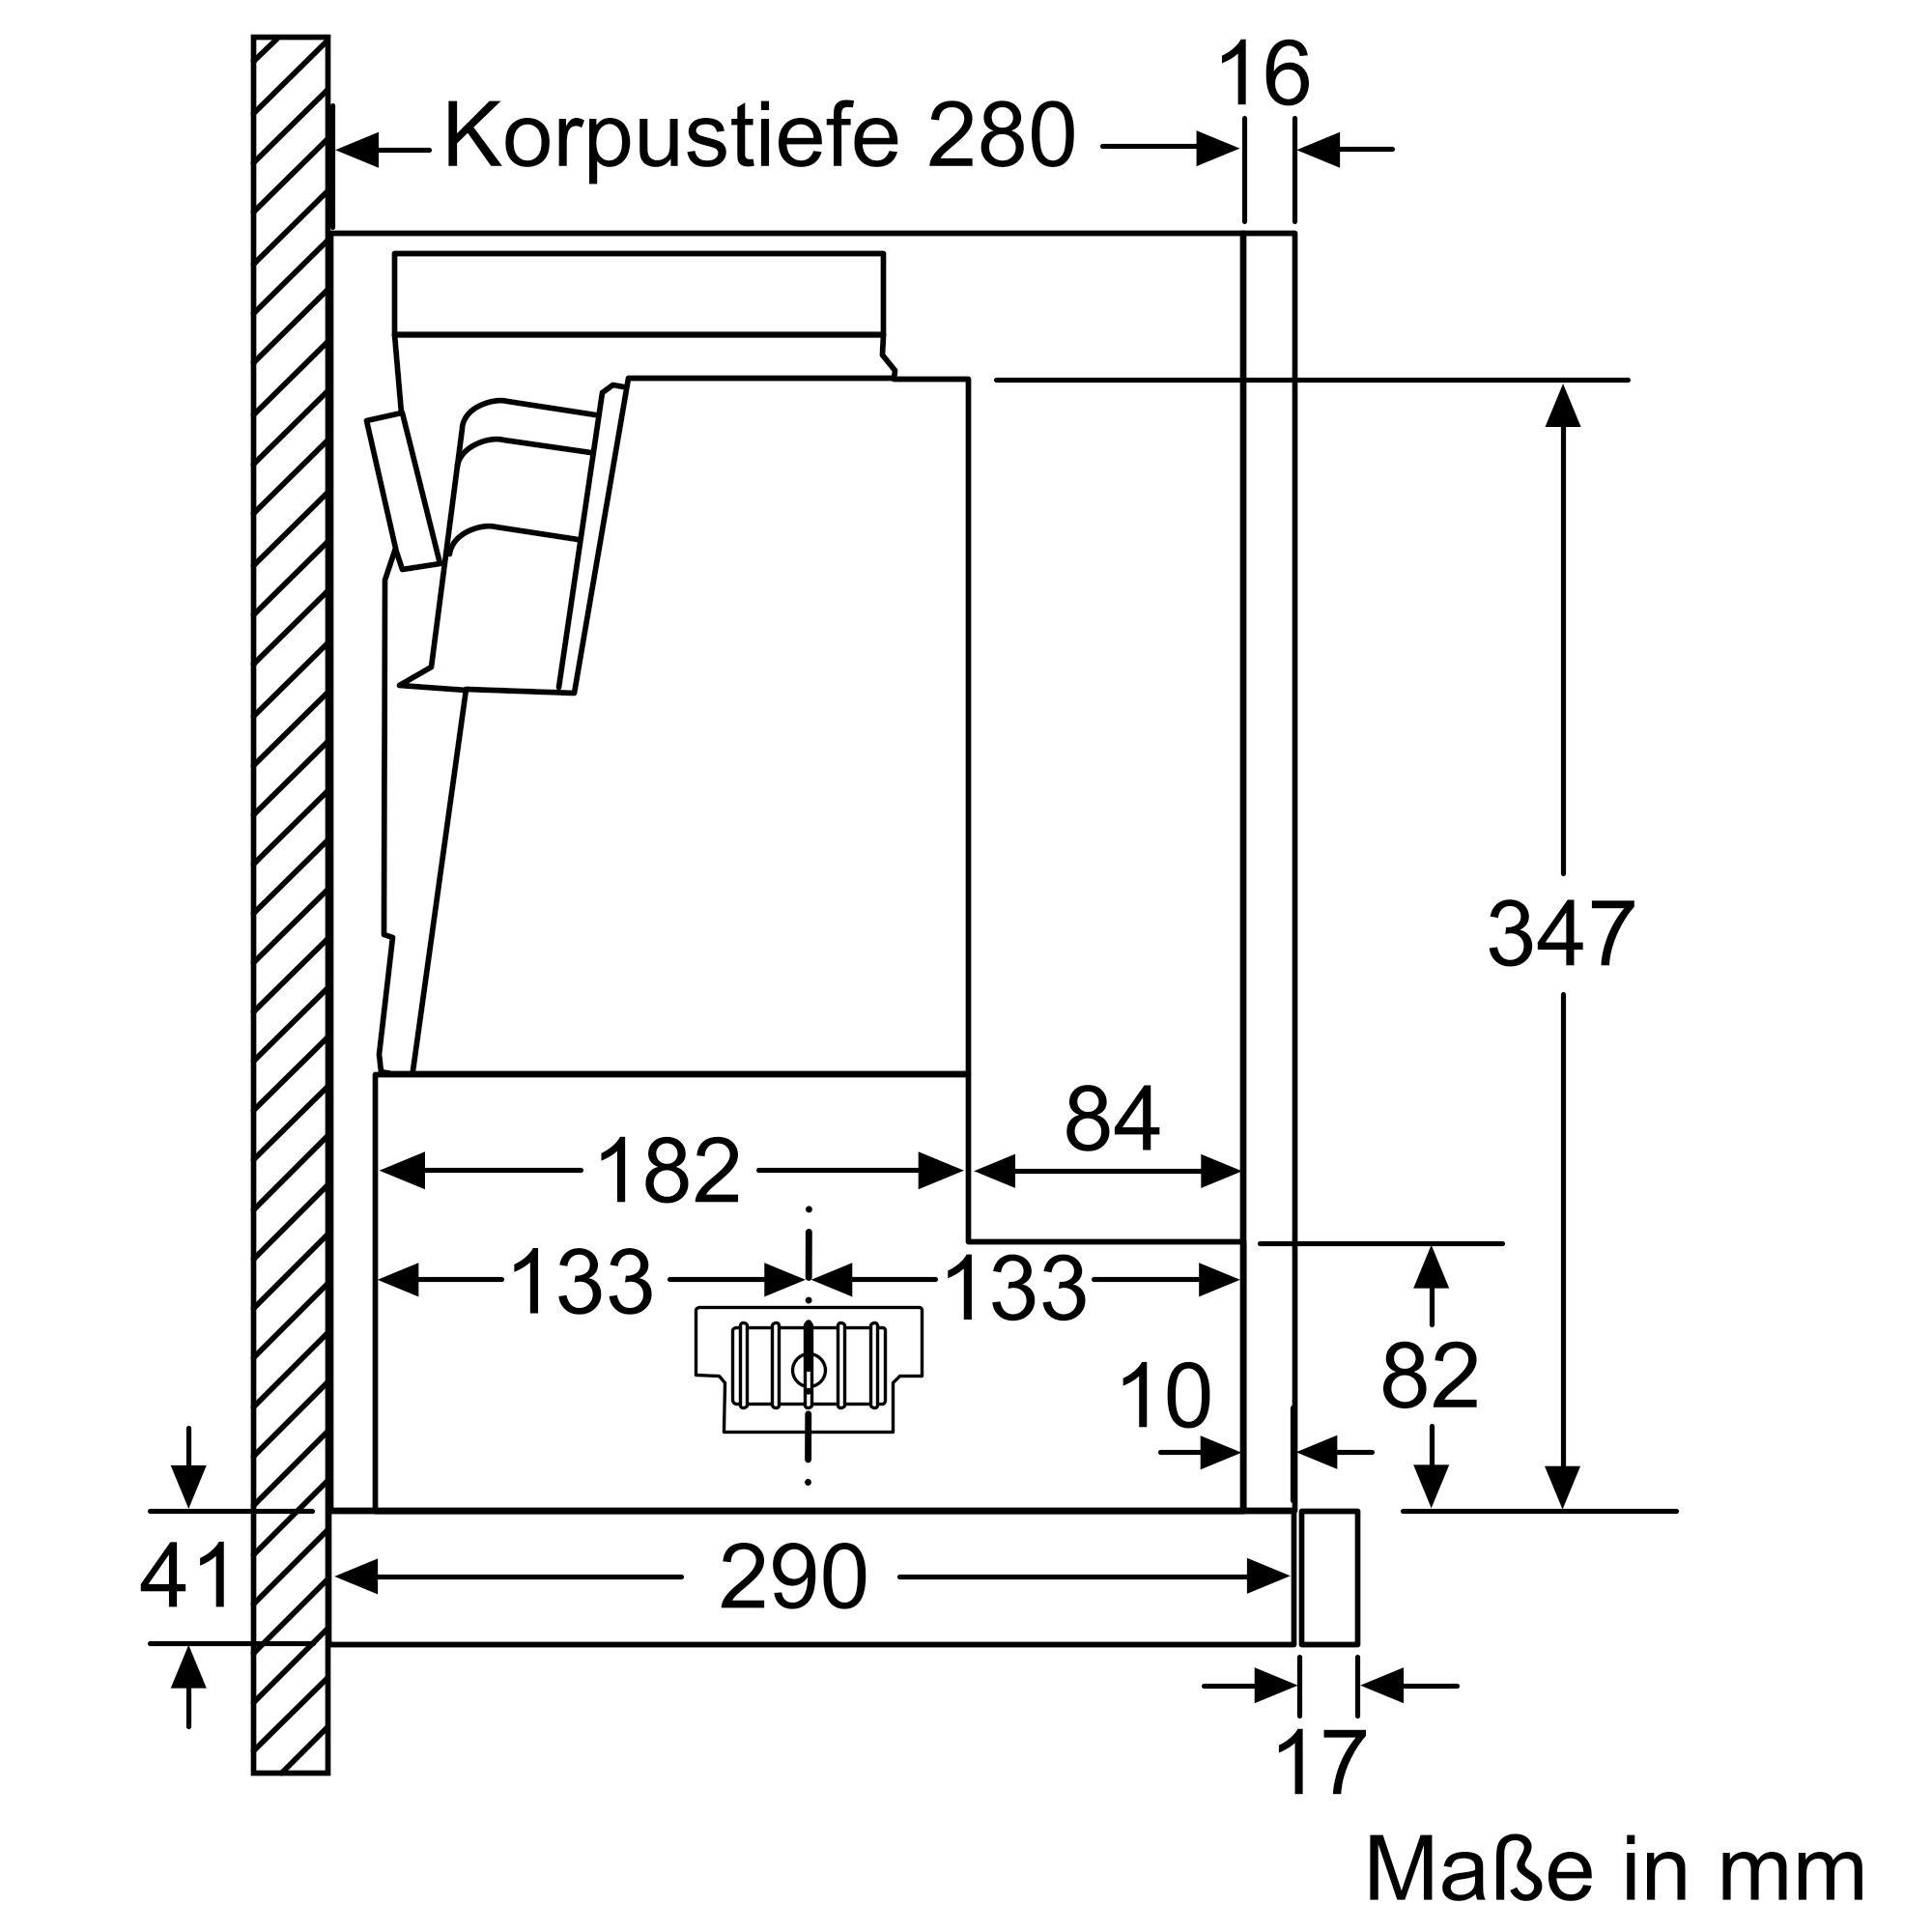 Siemens LI97SA561S Flachschirmhaube Edelstahl